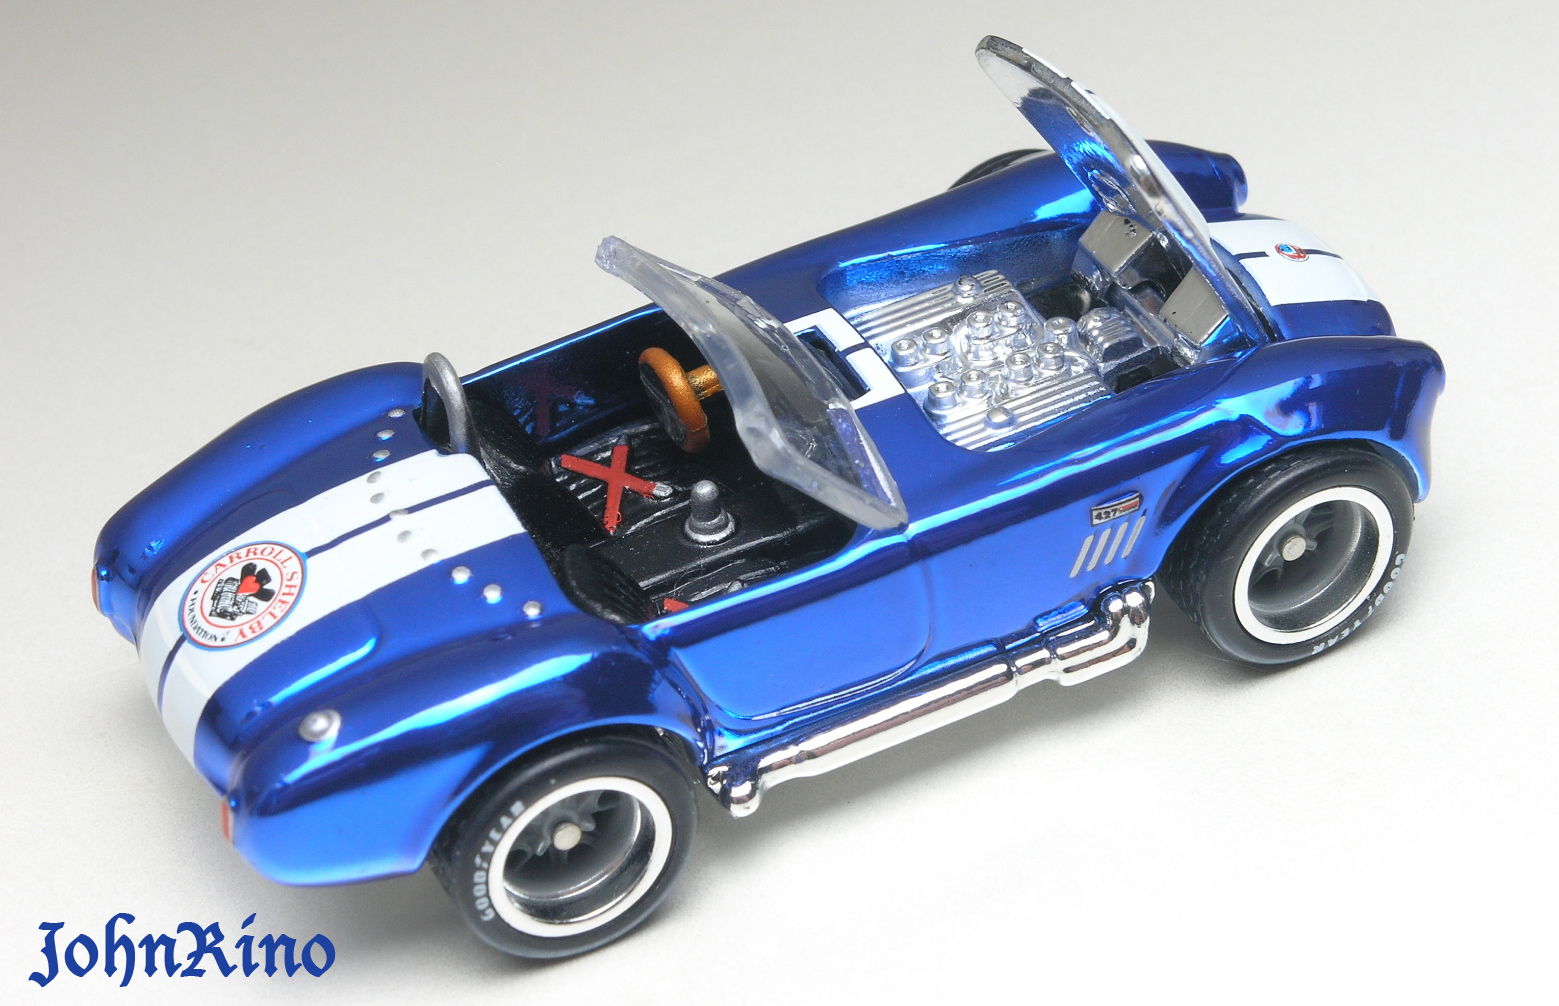 Hot wheels shelby cobra 427 s c 2013 rlc